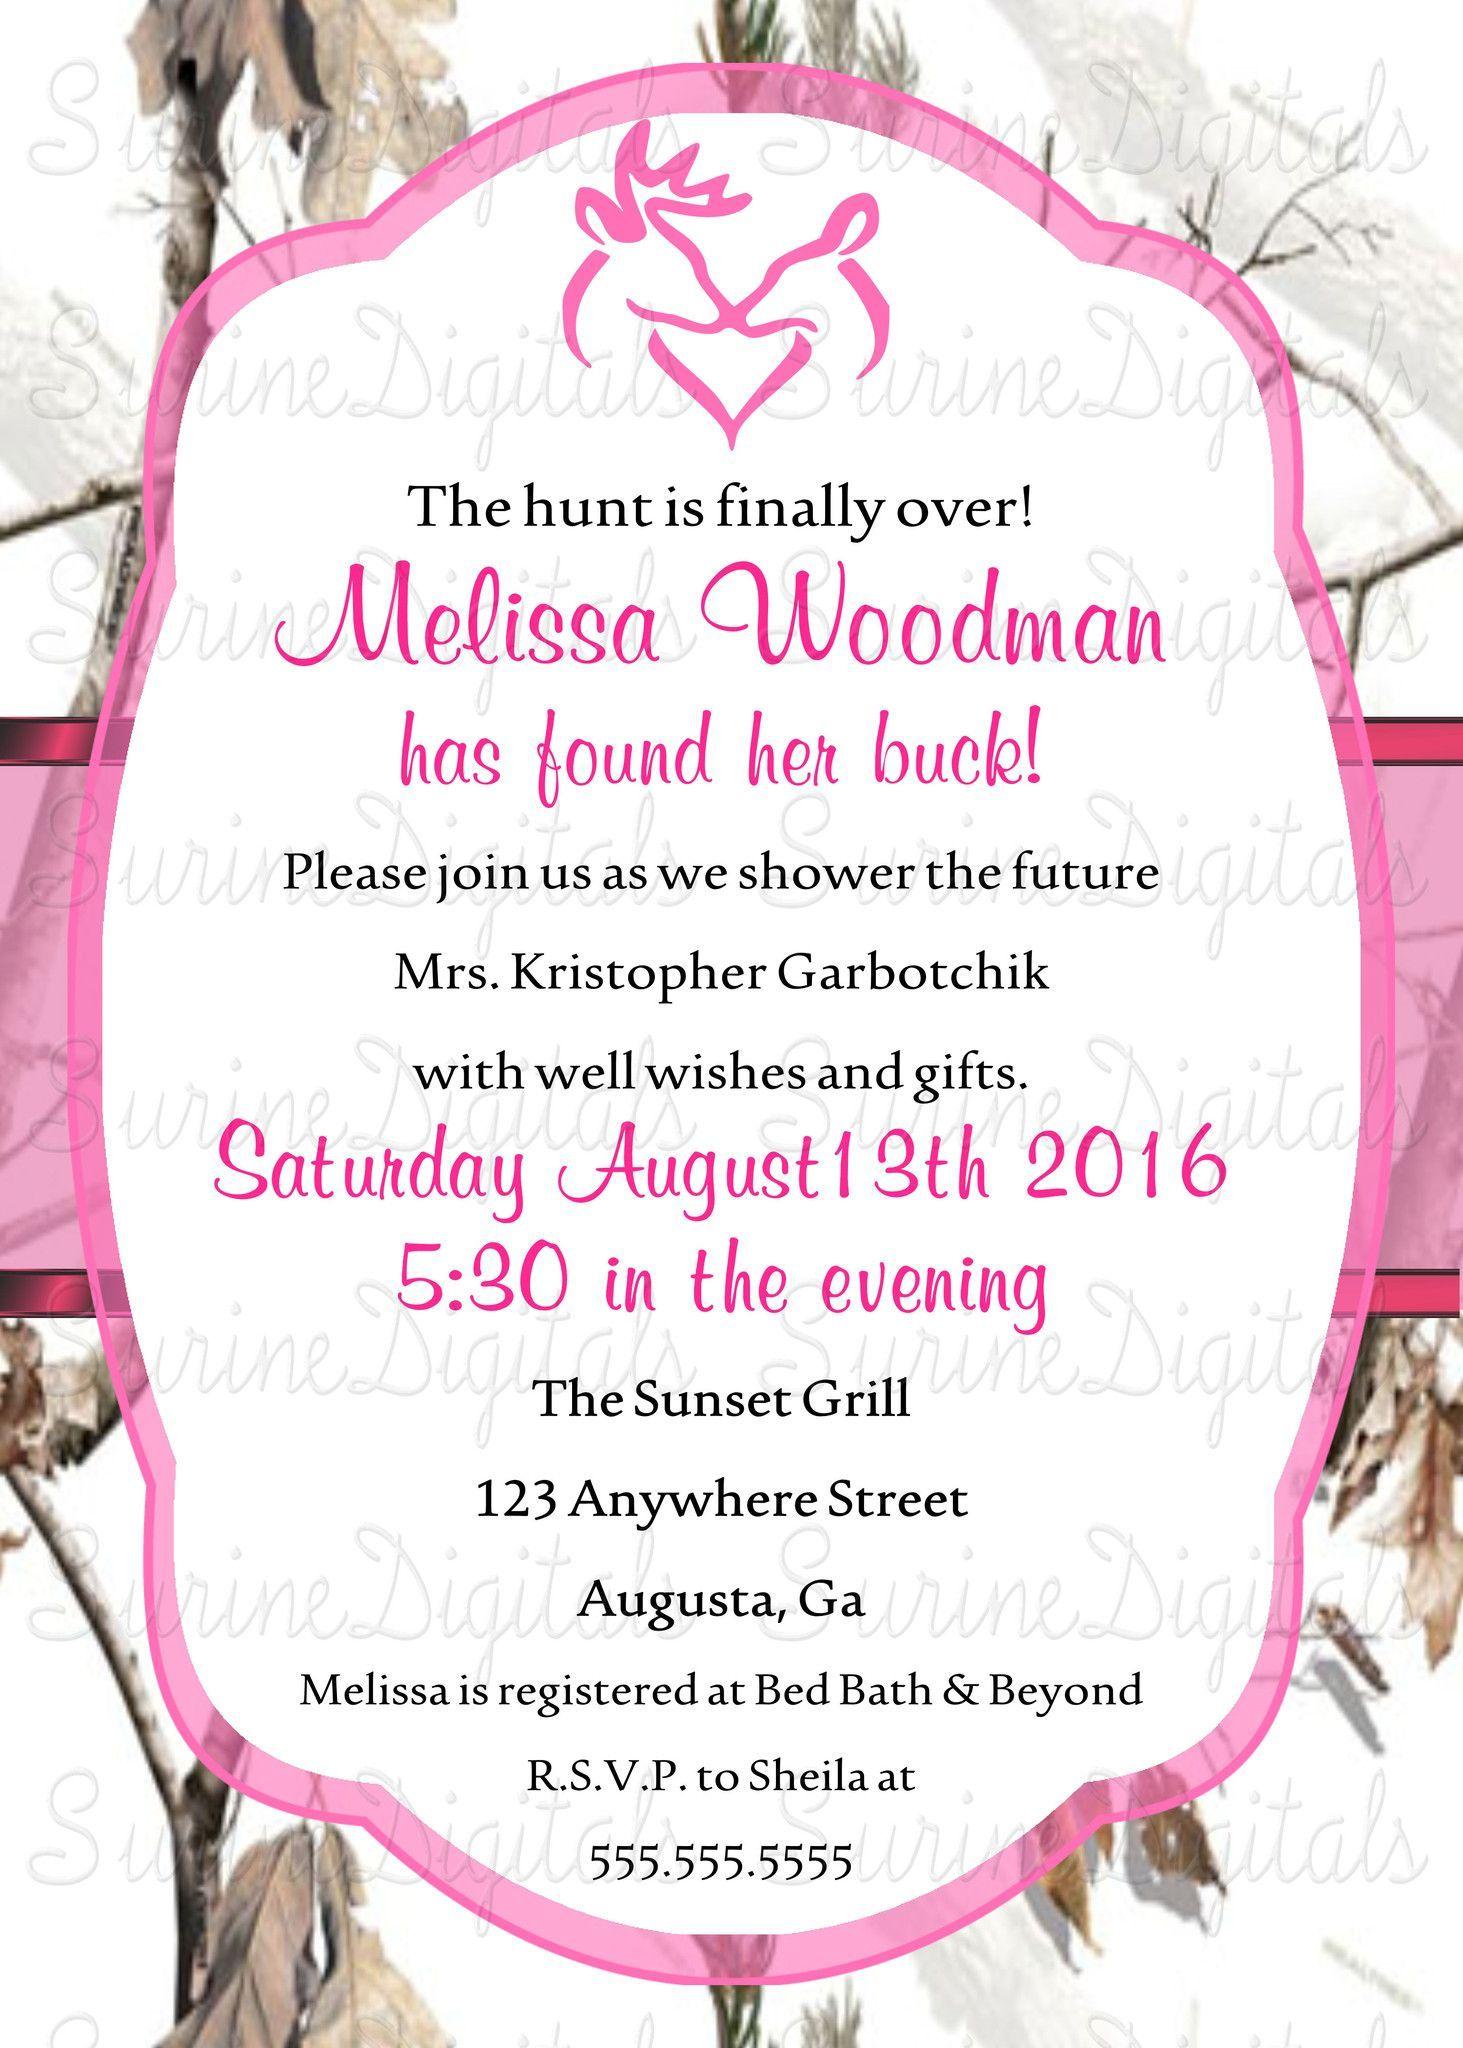 Realtree Snow camo Bridal Shower Invitation/ Country Themed Wedding ...